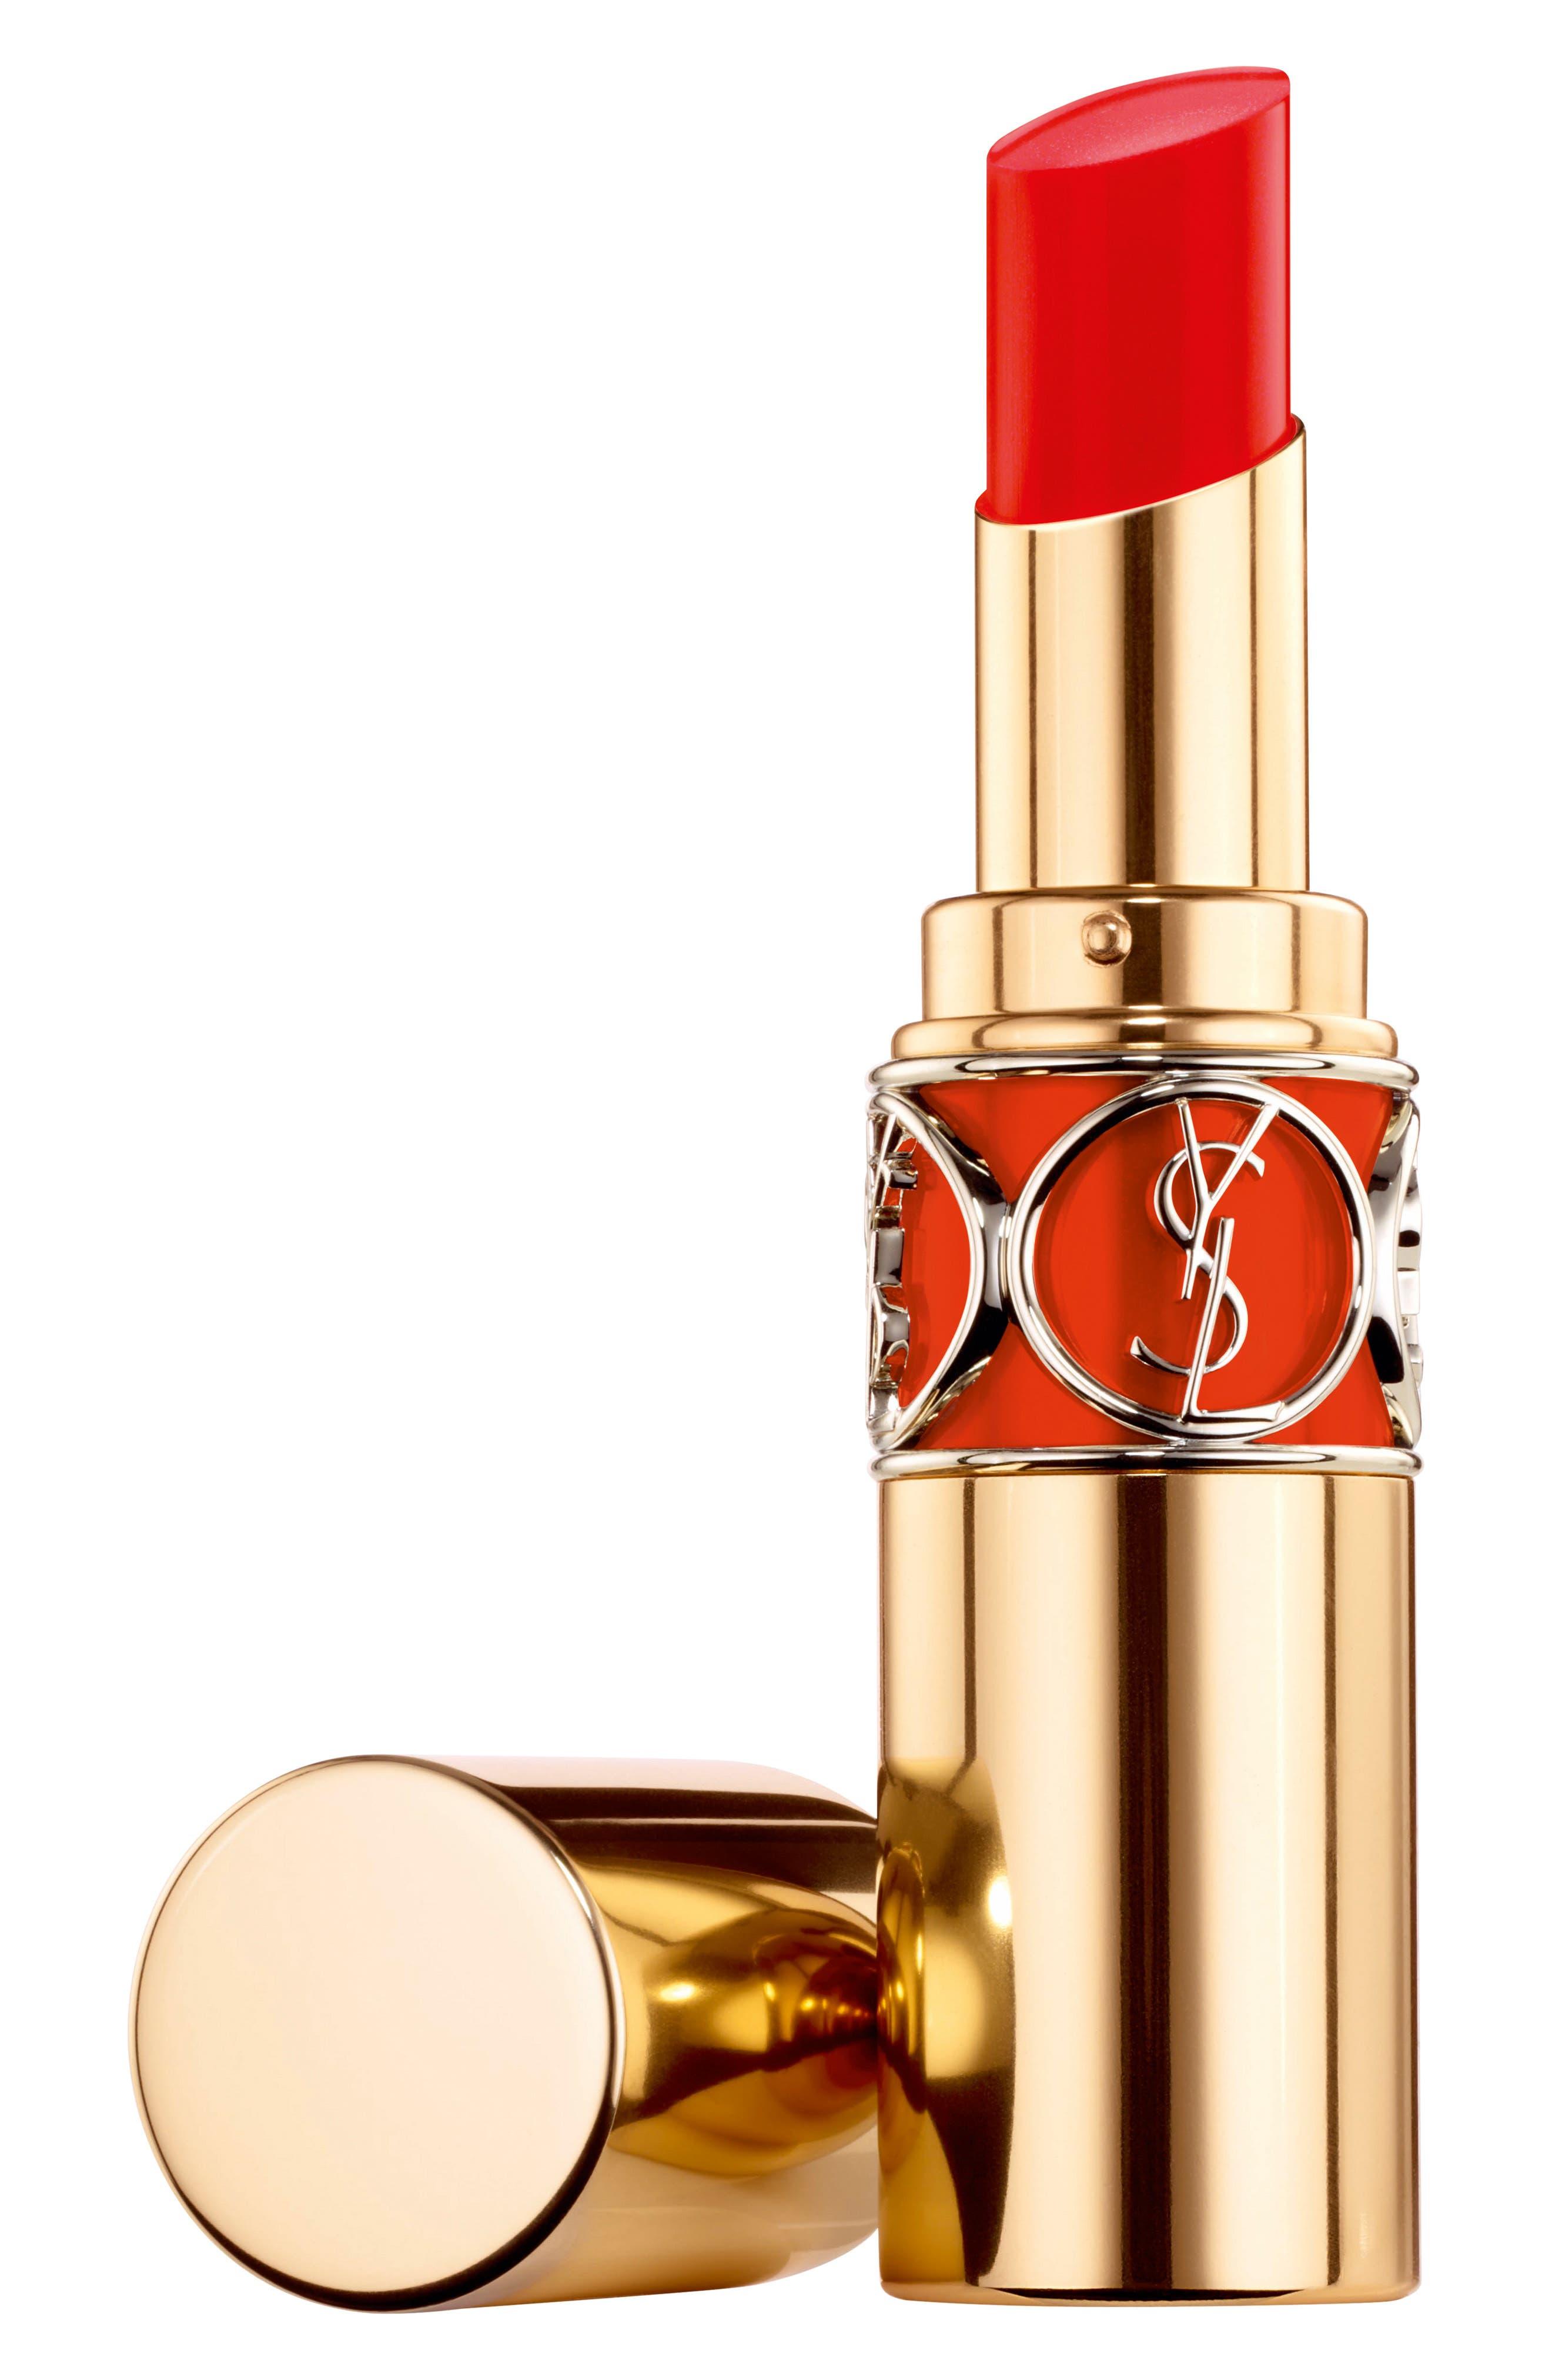 Yves Saint Laurent Rouge Volupte Shine Oil-In-Stick Lipstick - 46 Orange Perfecto